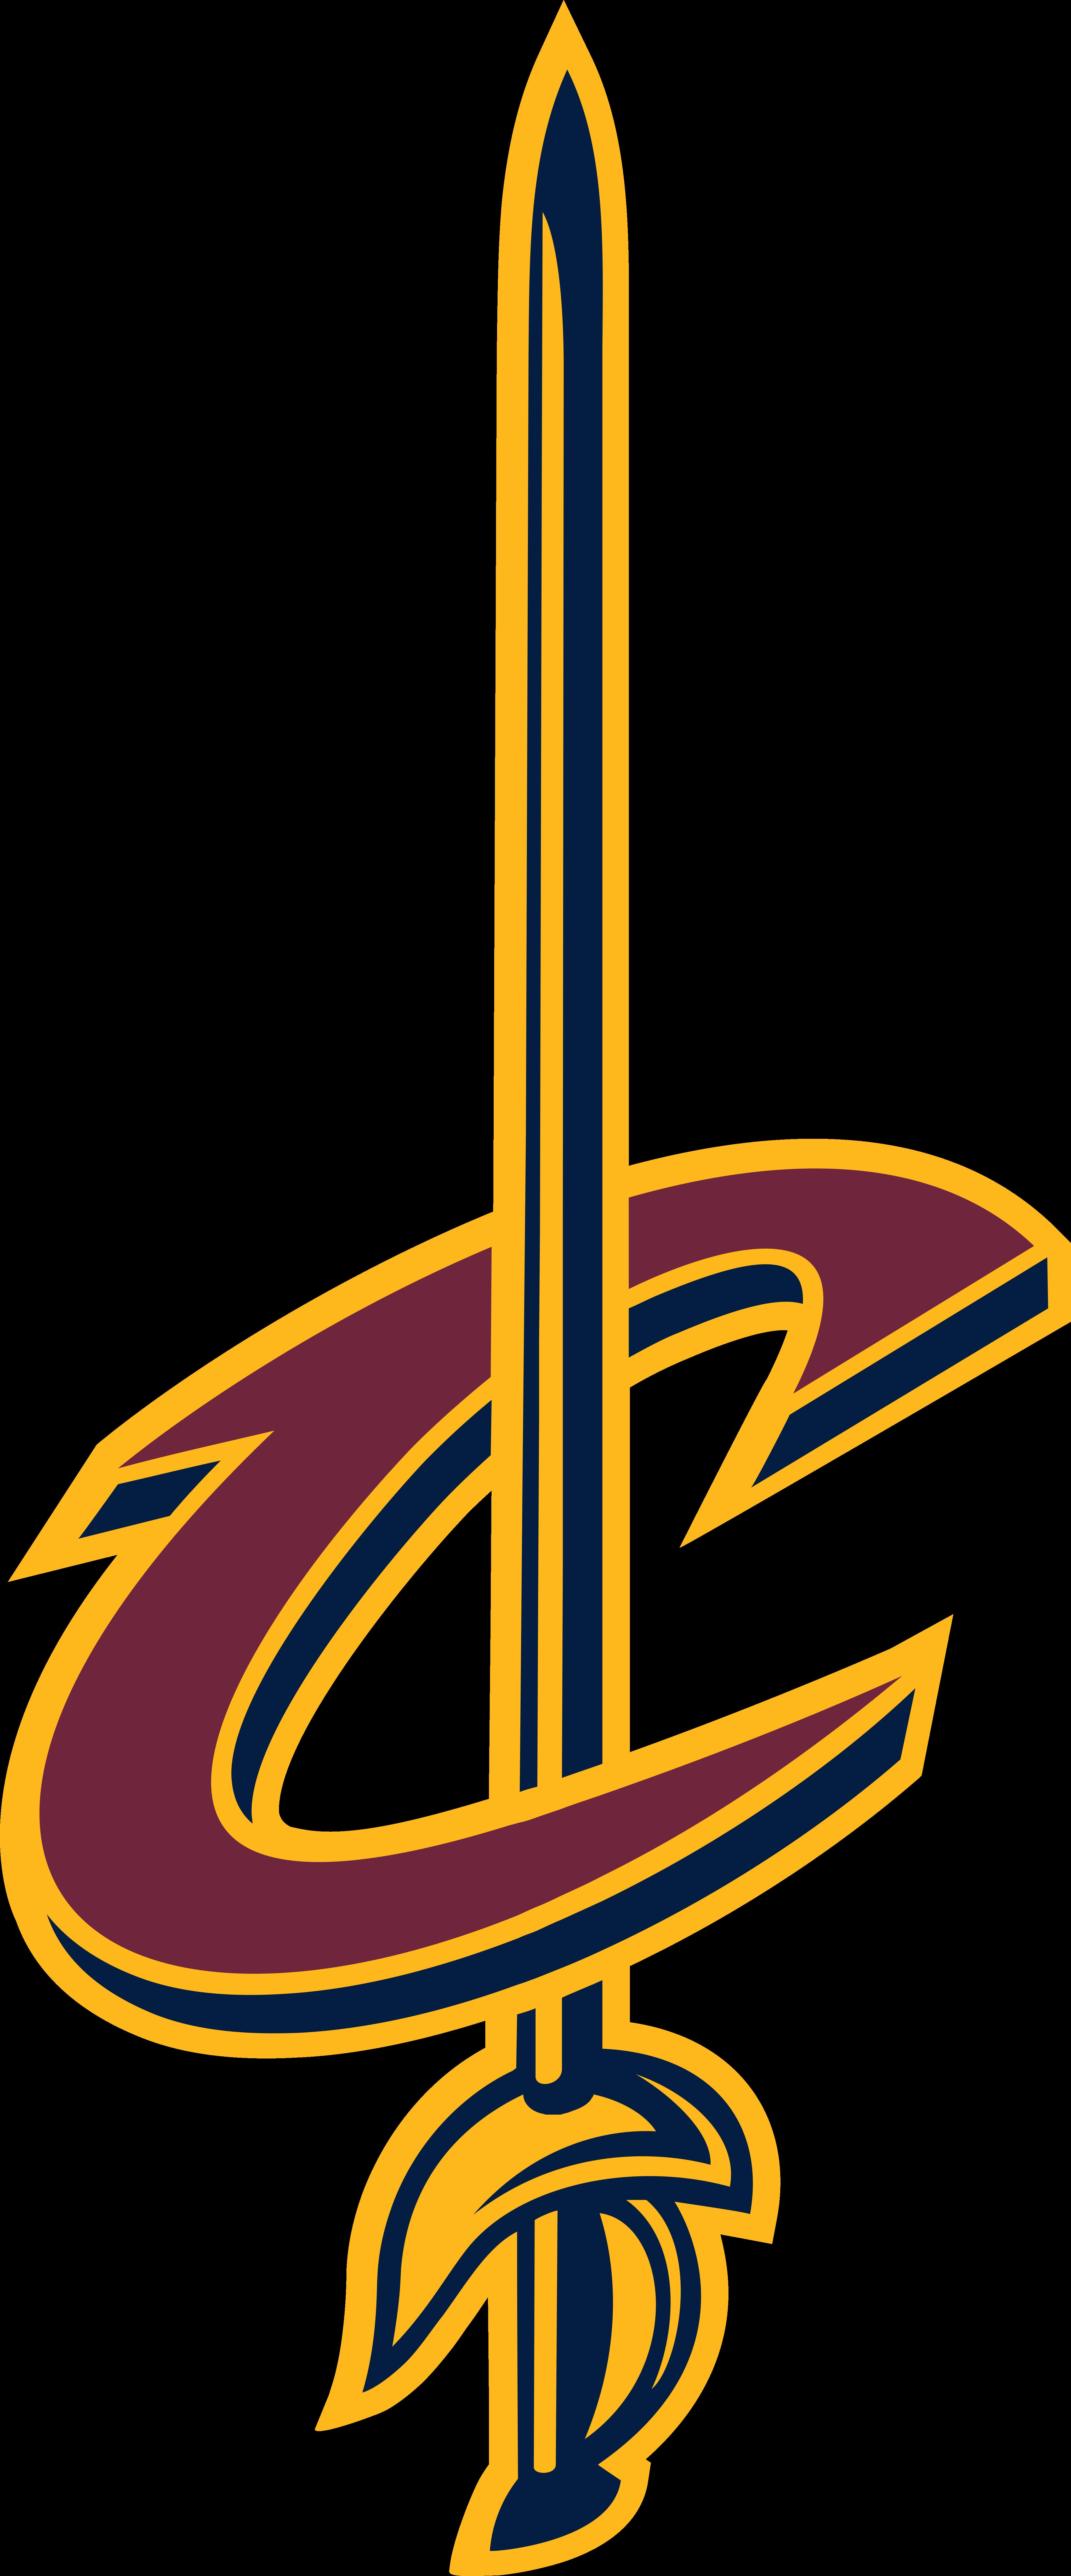 cleveland cavaliers logo 1 - Cleveland Cavaliers Logo